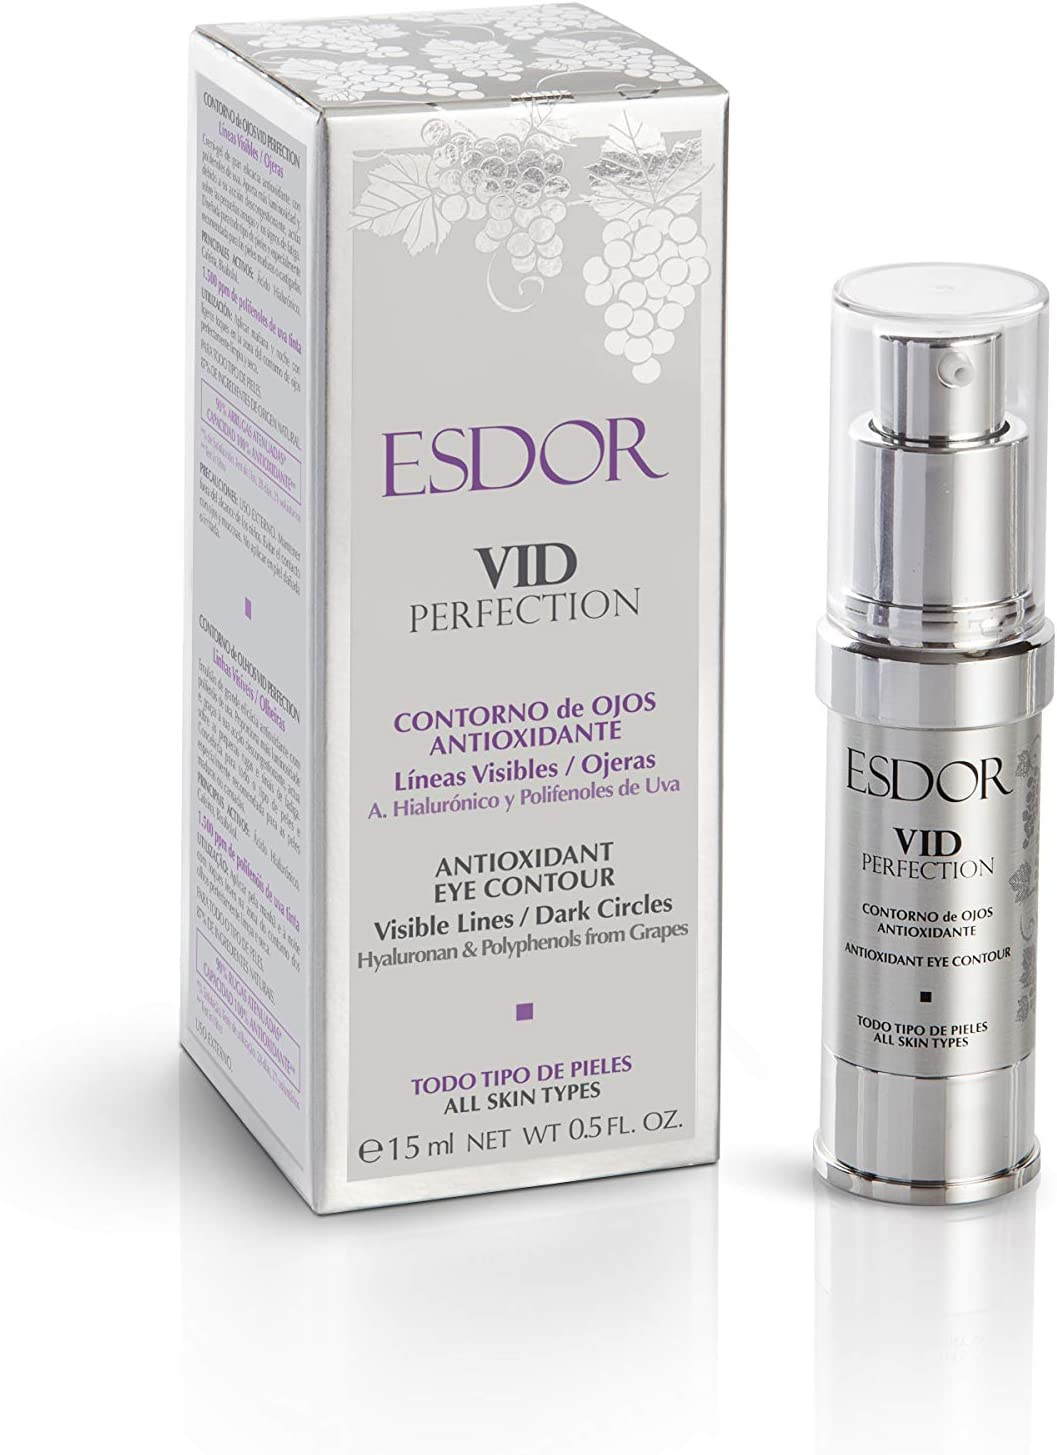 Contorno de ojos antioxidante Vid Perfection 15 ml